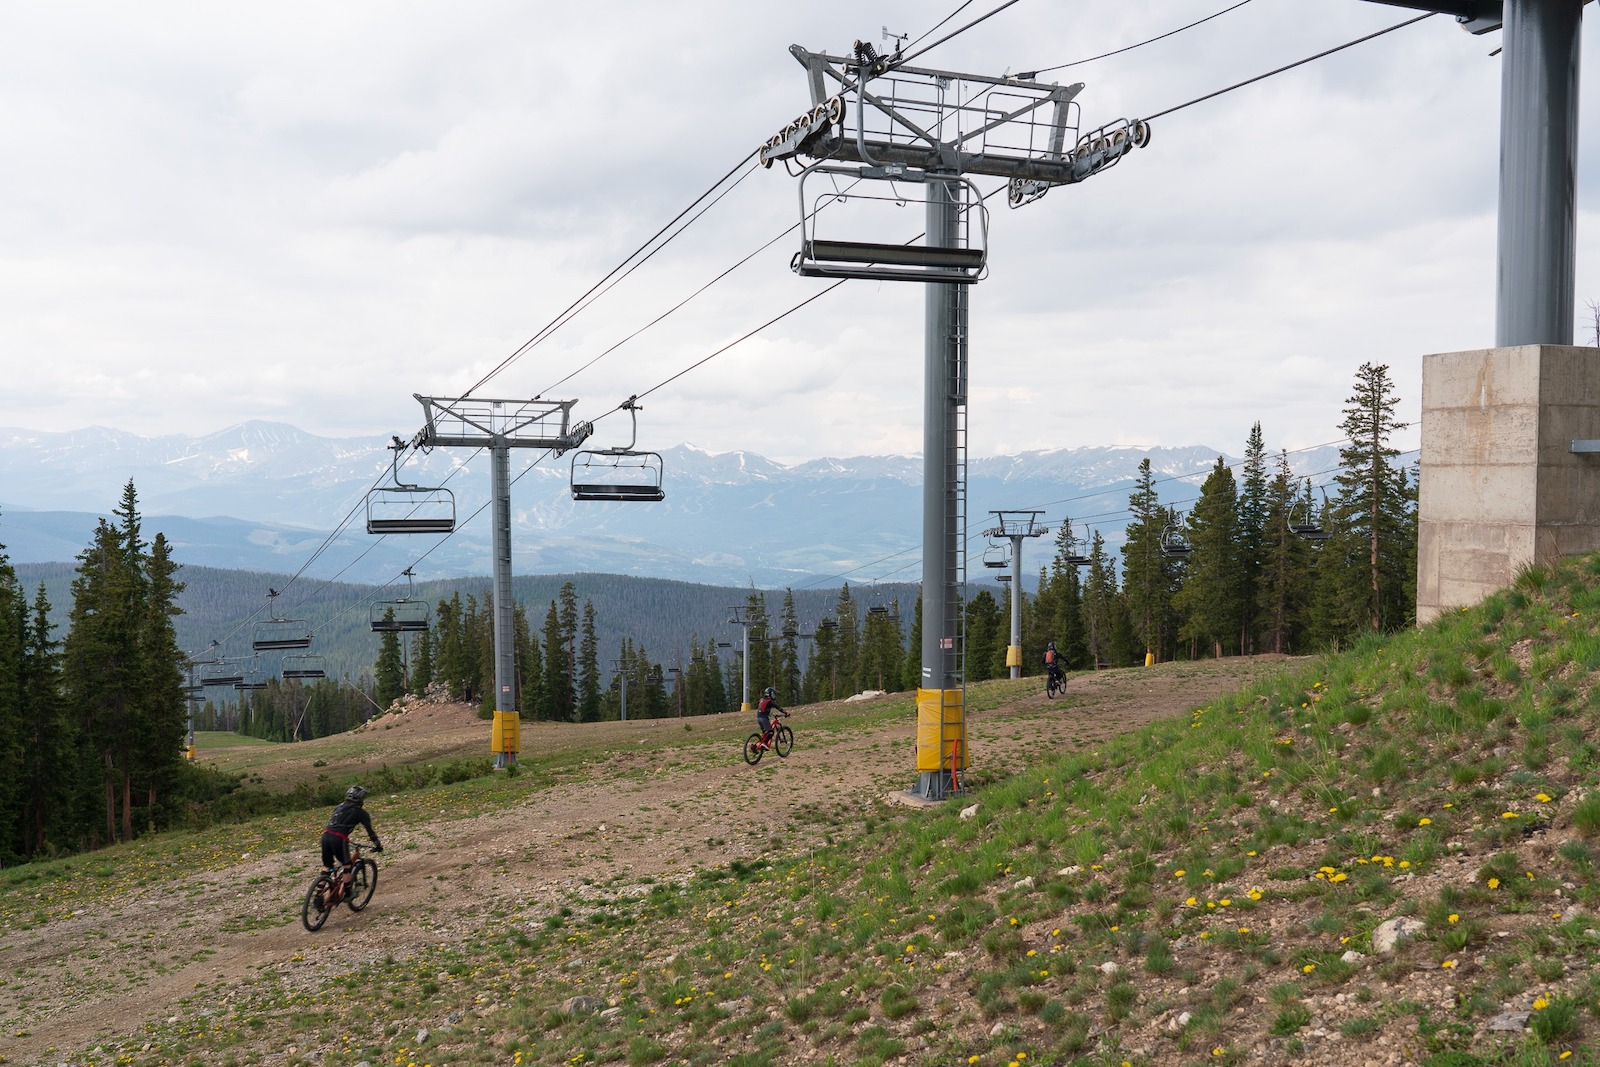 Image of people mountain biking at Keystone Resort in Colorado